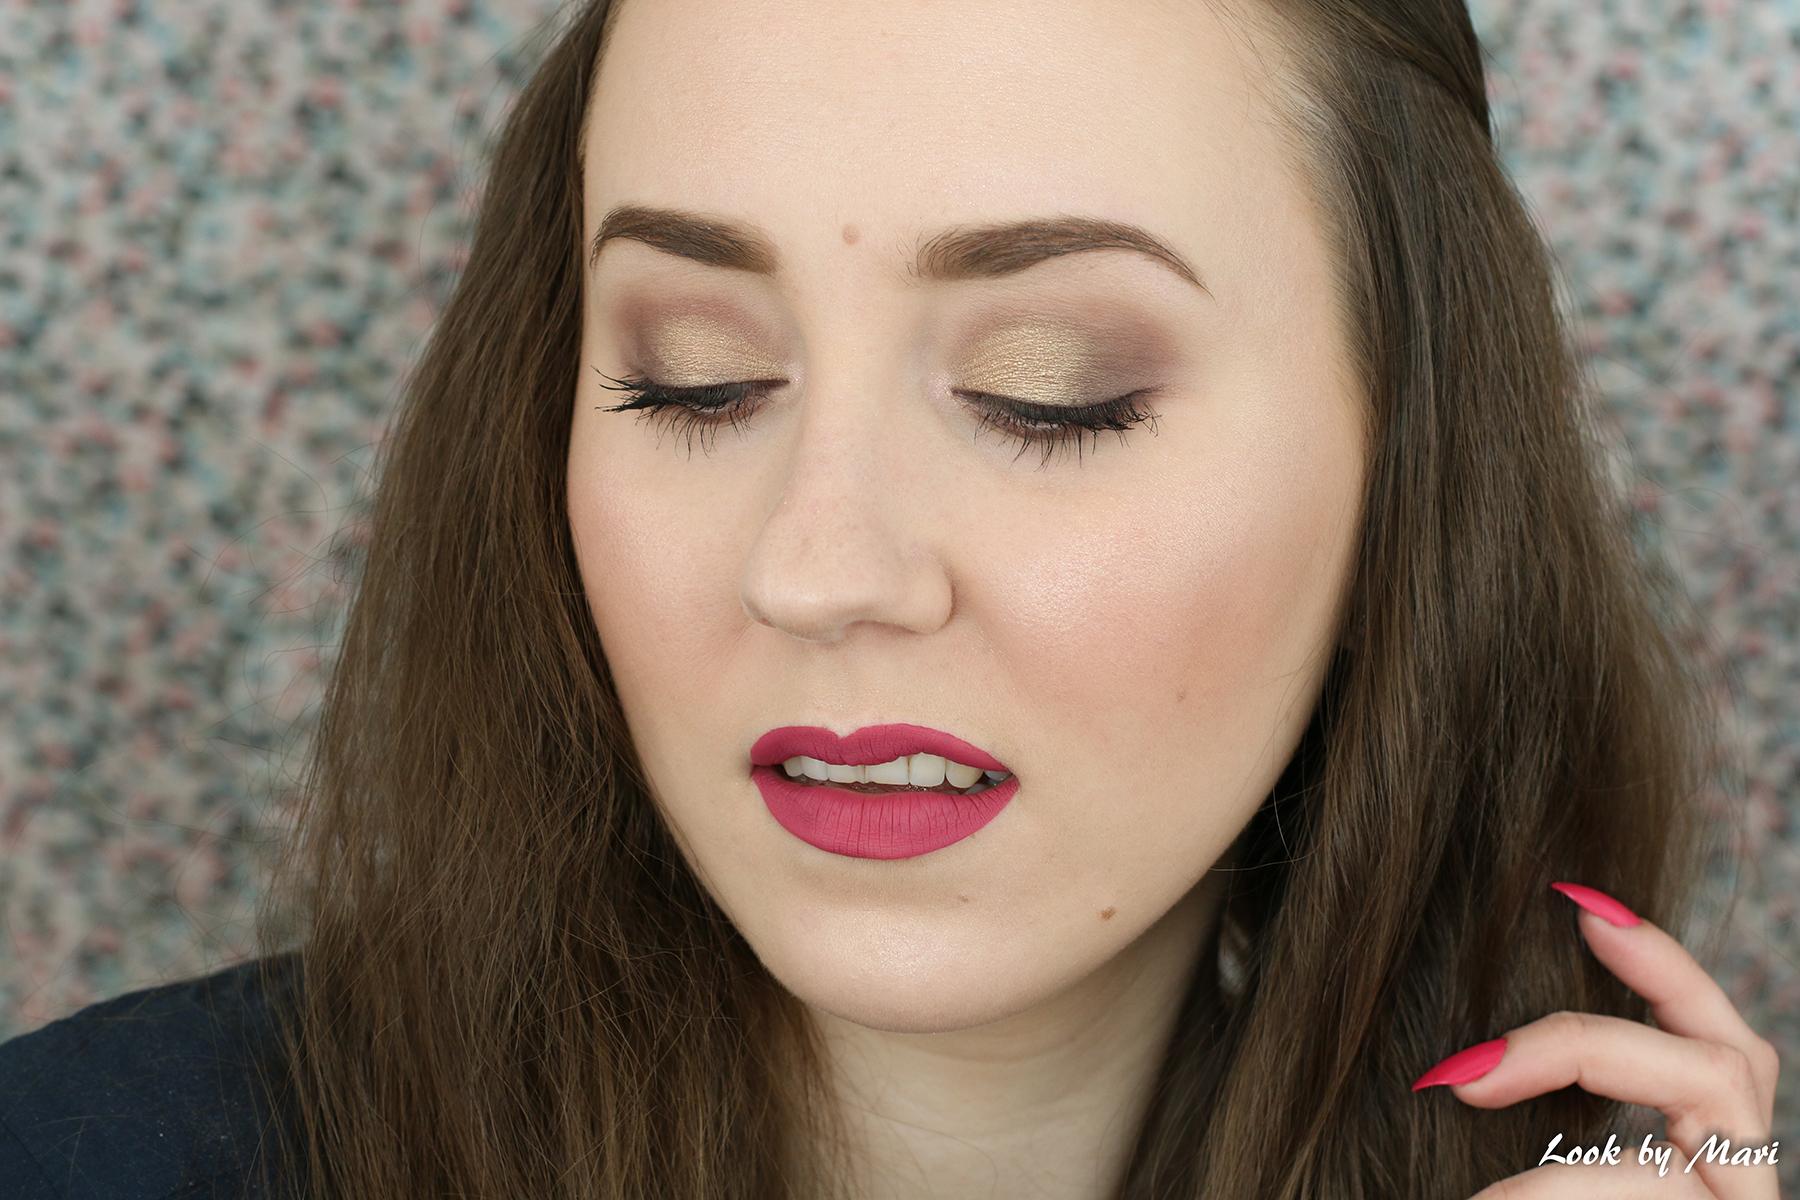 7 nyx love contours all palette review kokemuksia makeup looks ideas inspo inspiration gold